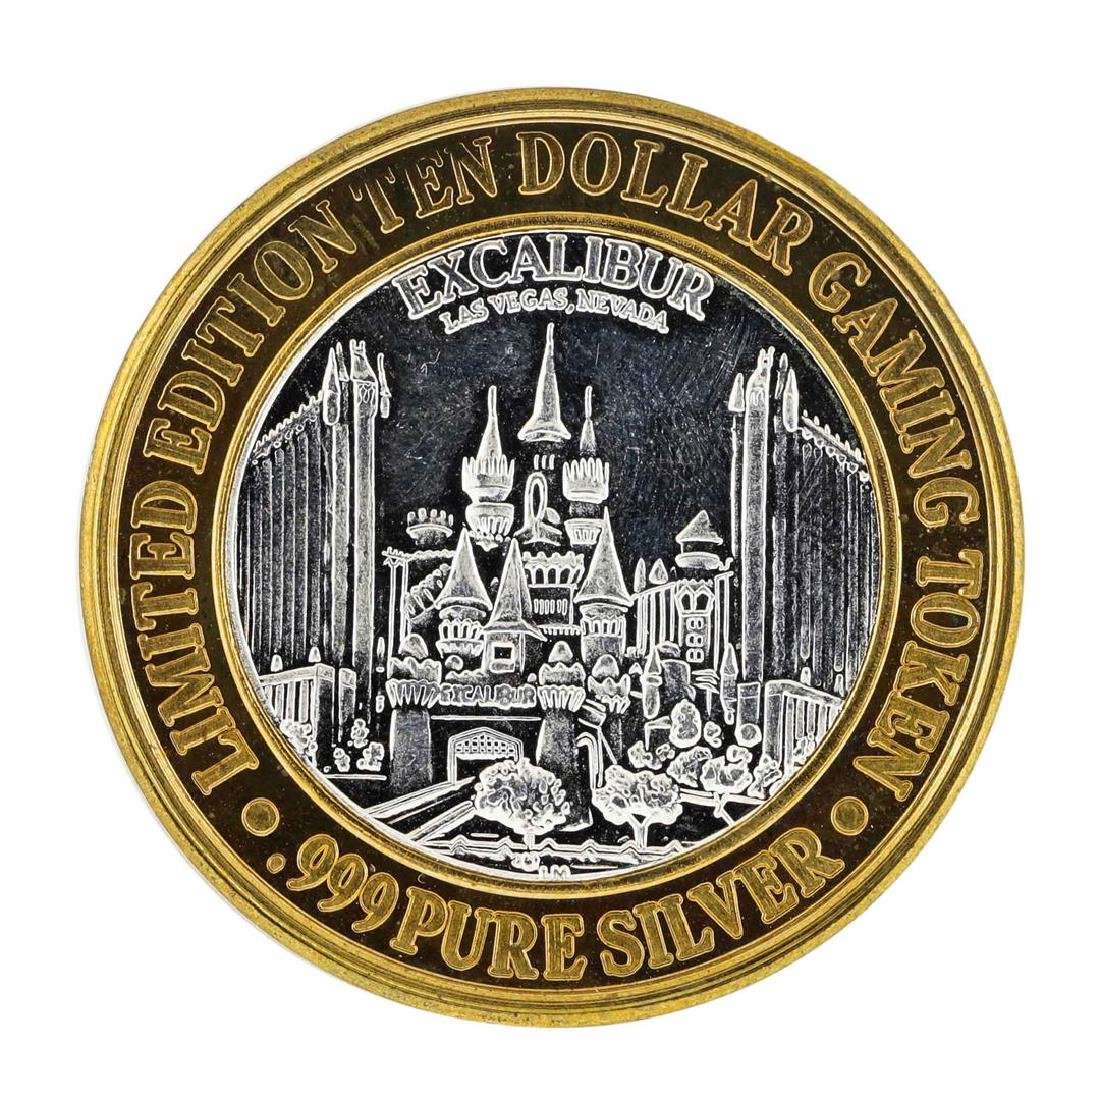 .999 Silver Excalibur Las Vegas, NV $10 Casino Limited - 2